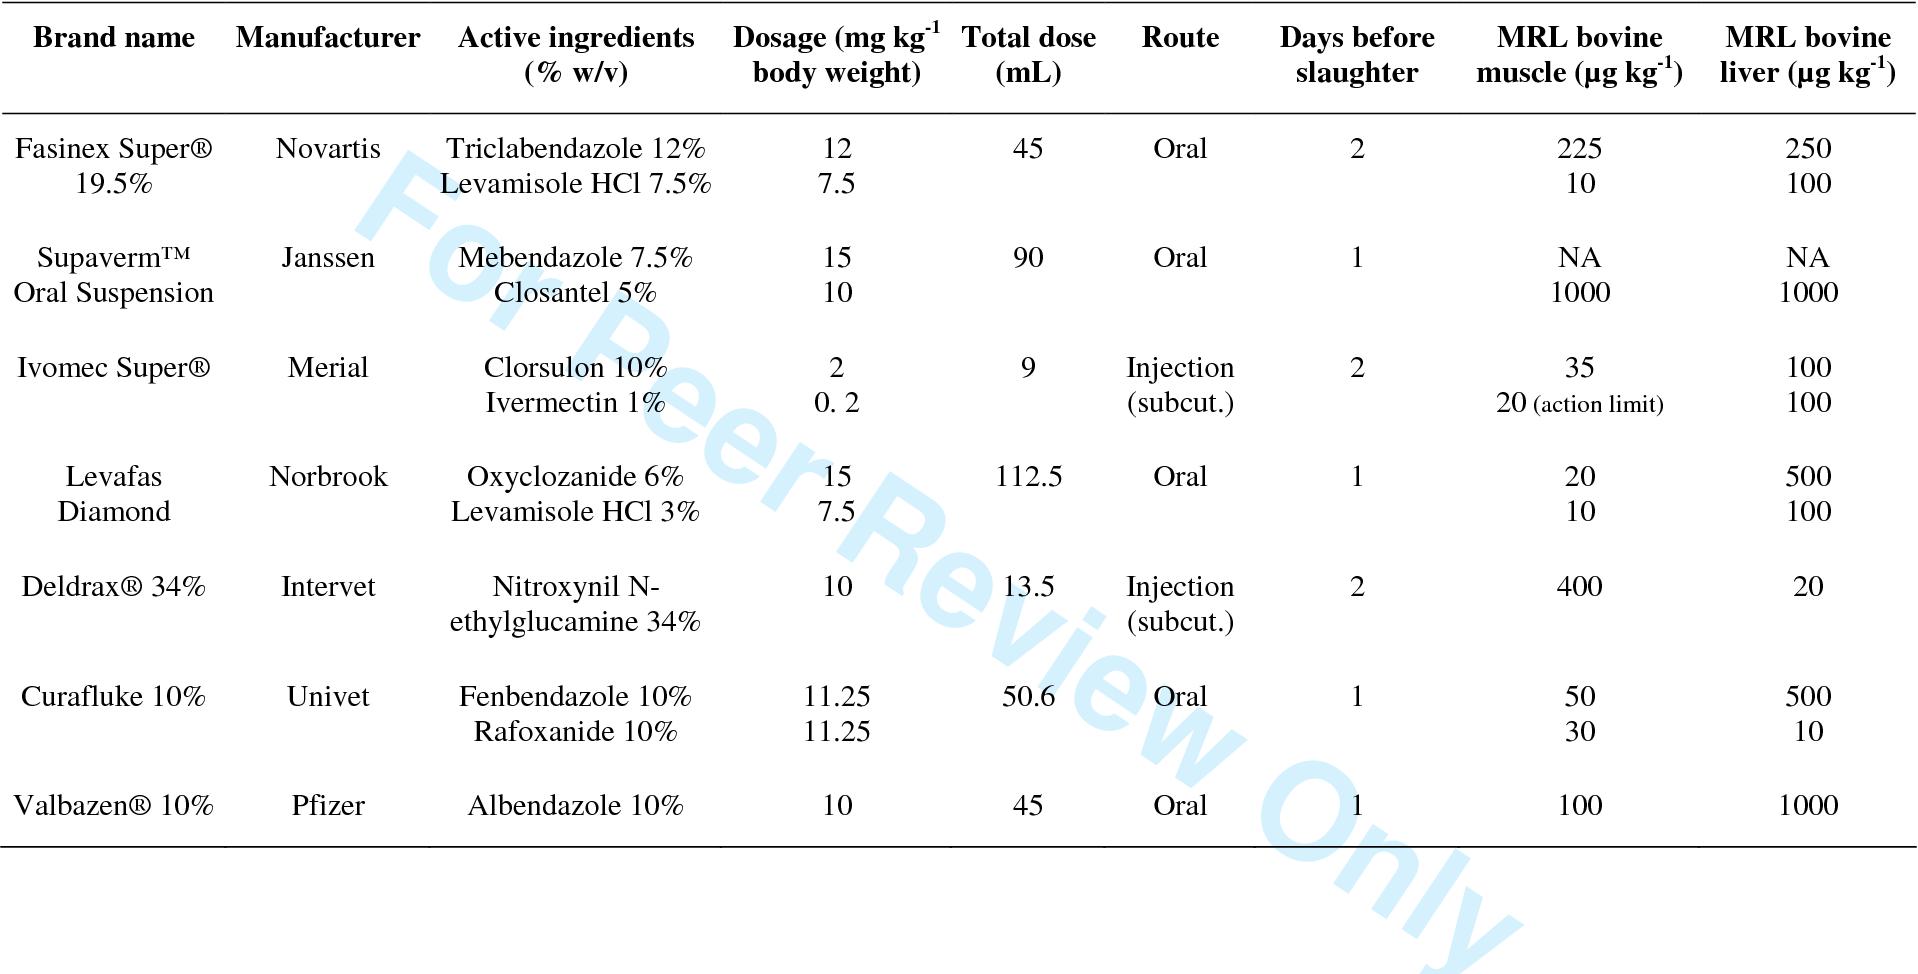 anthelmintic drug residues